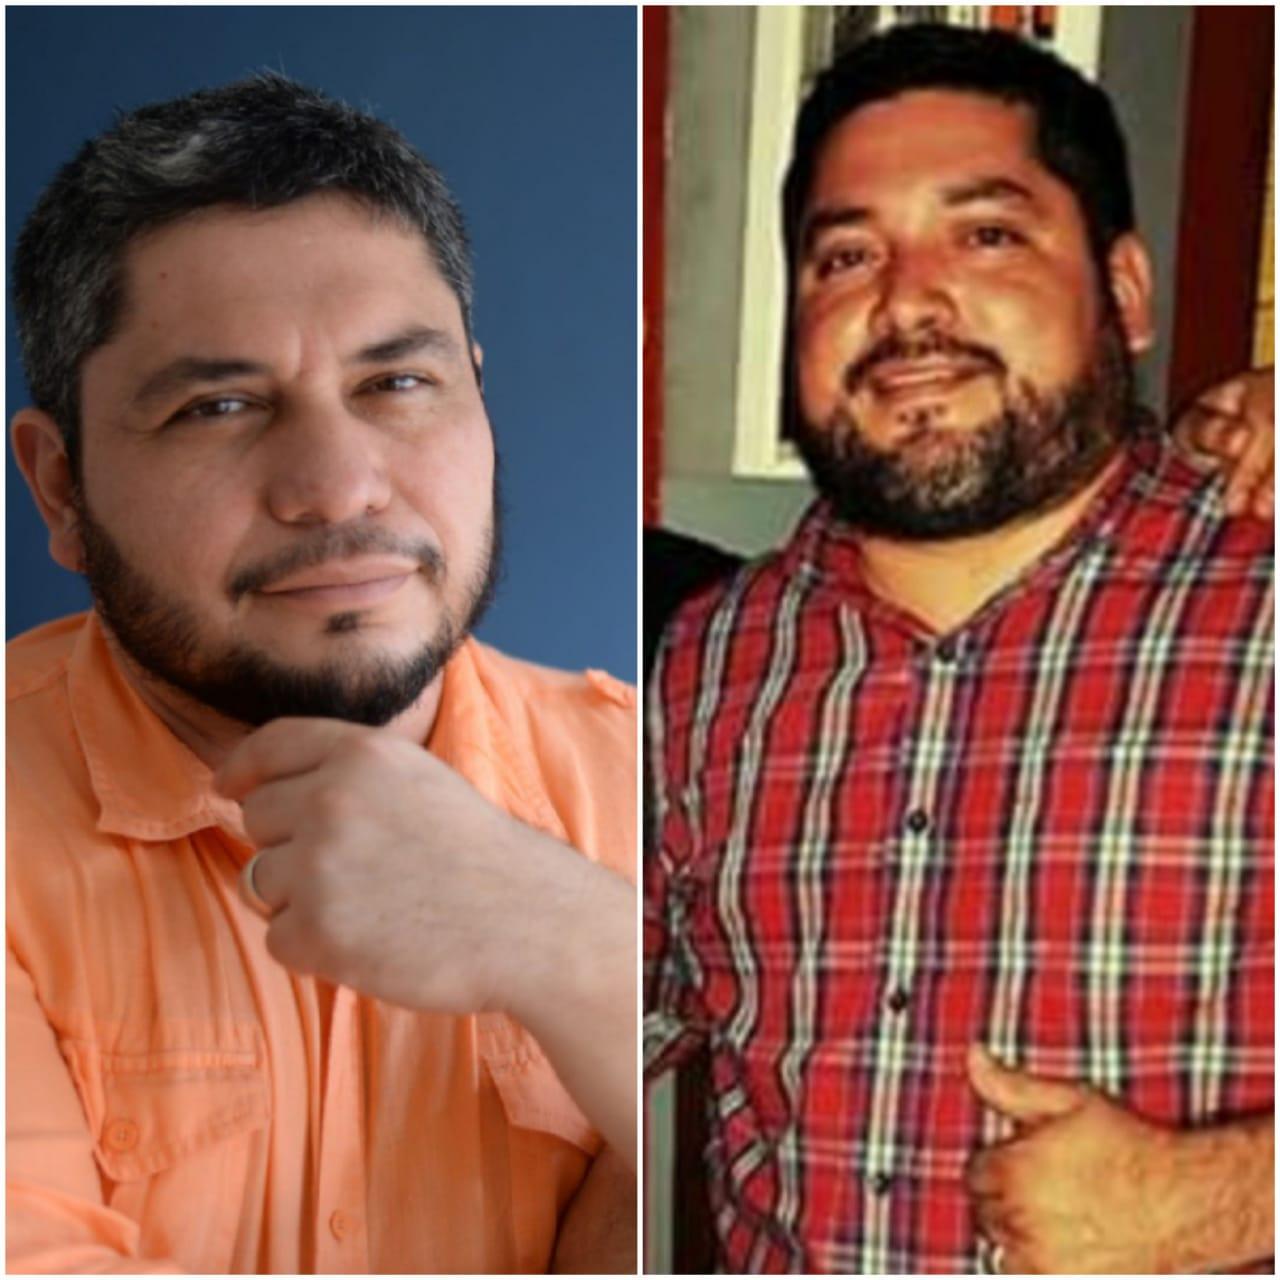 Eliseo Núñez denuncia amenazas de muerte por parte de un paramilitar